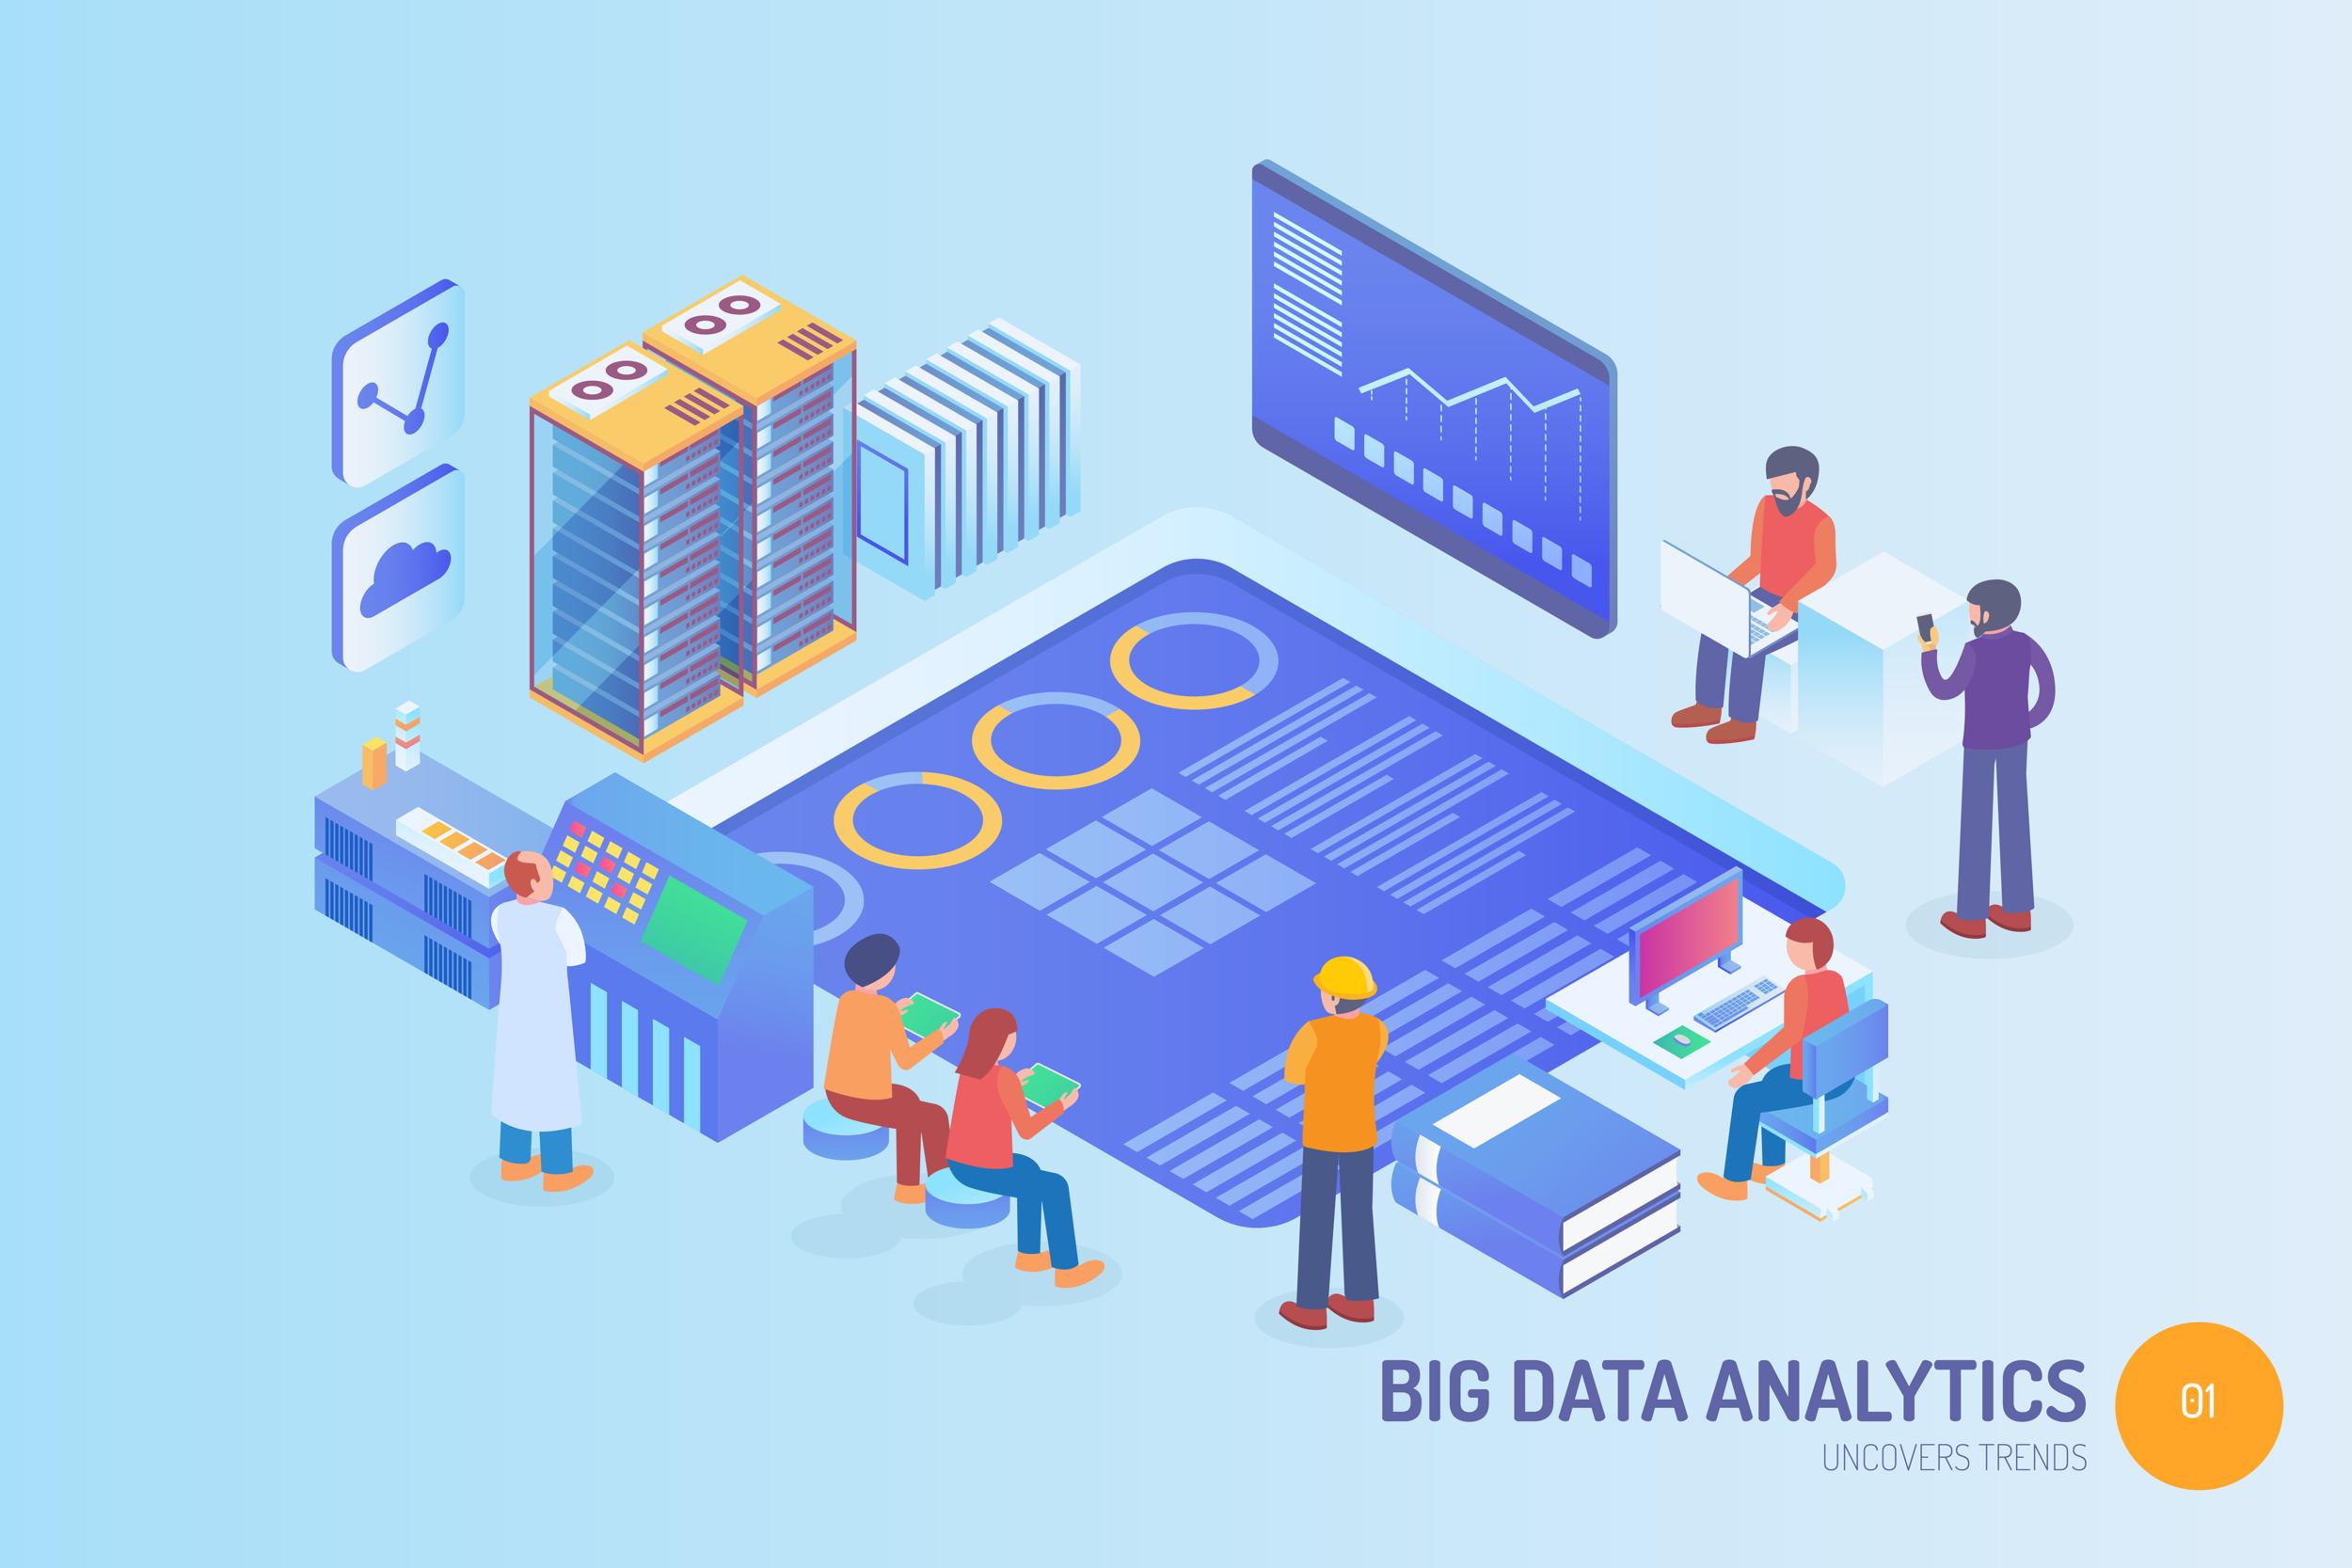 Big data analytics uncovers trends.